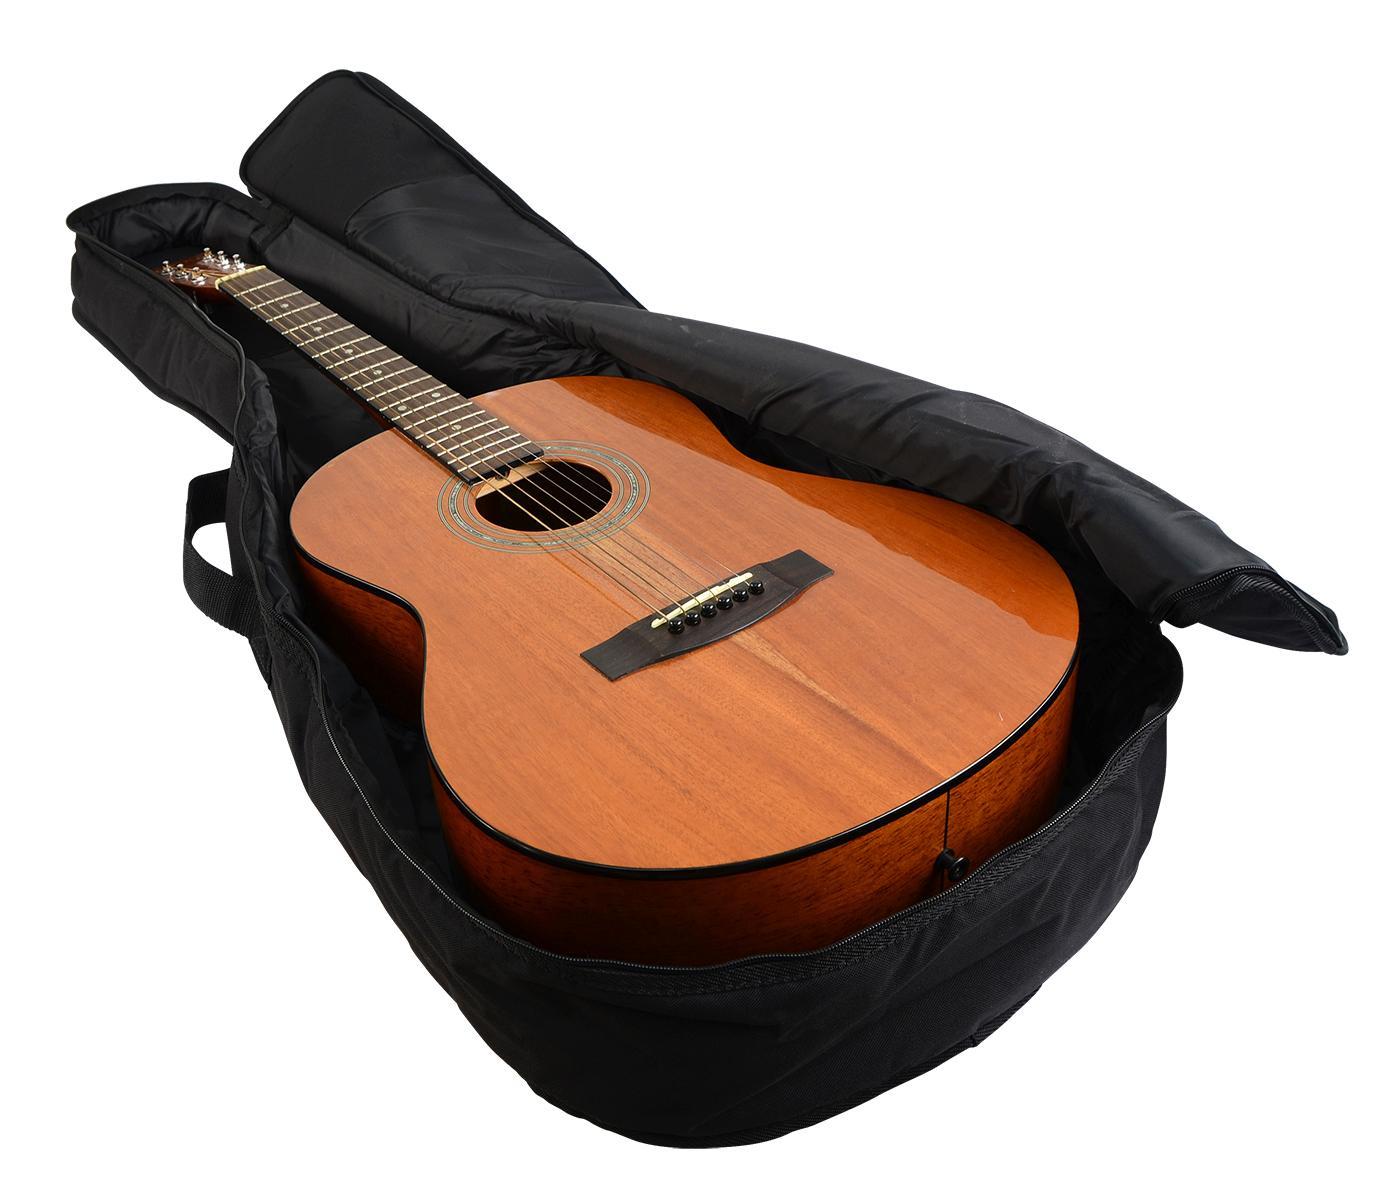 Acoustic Guitar Bag : gator gbe mini acou acoustic guitar bag musical instruments ~ Vivirlamusica.com Haus und Dekorationen